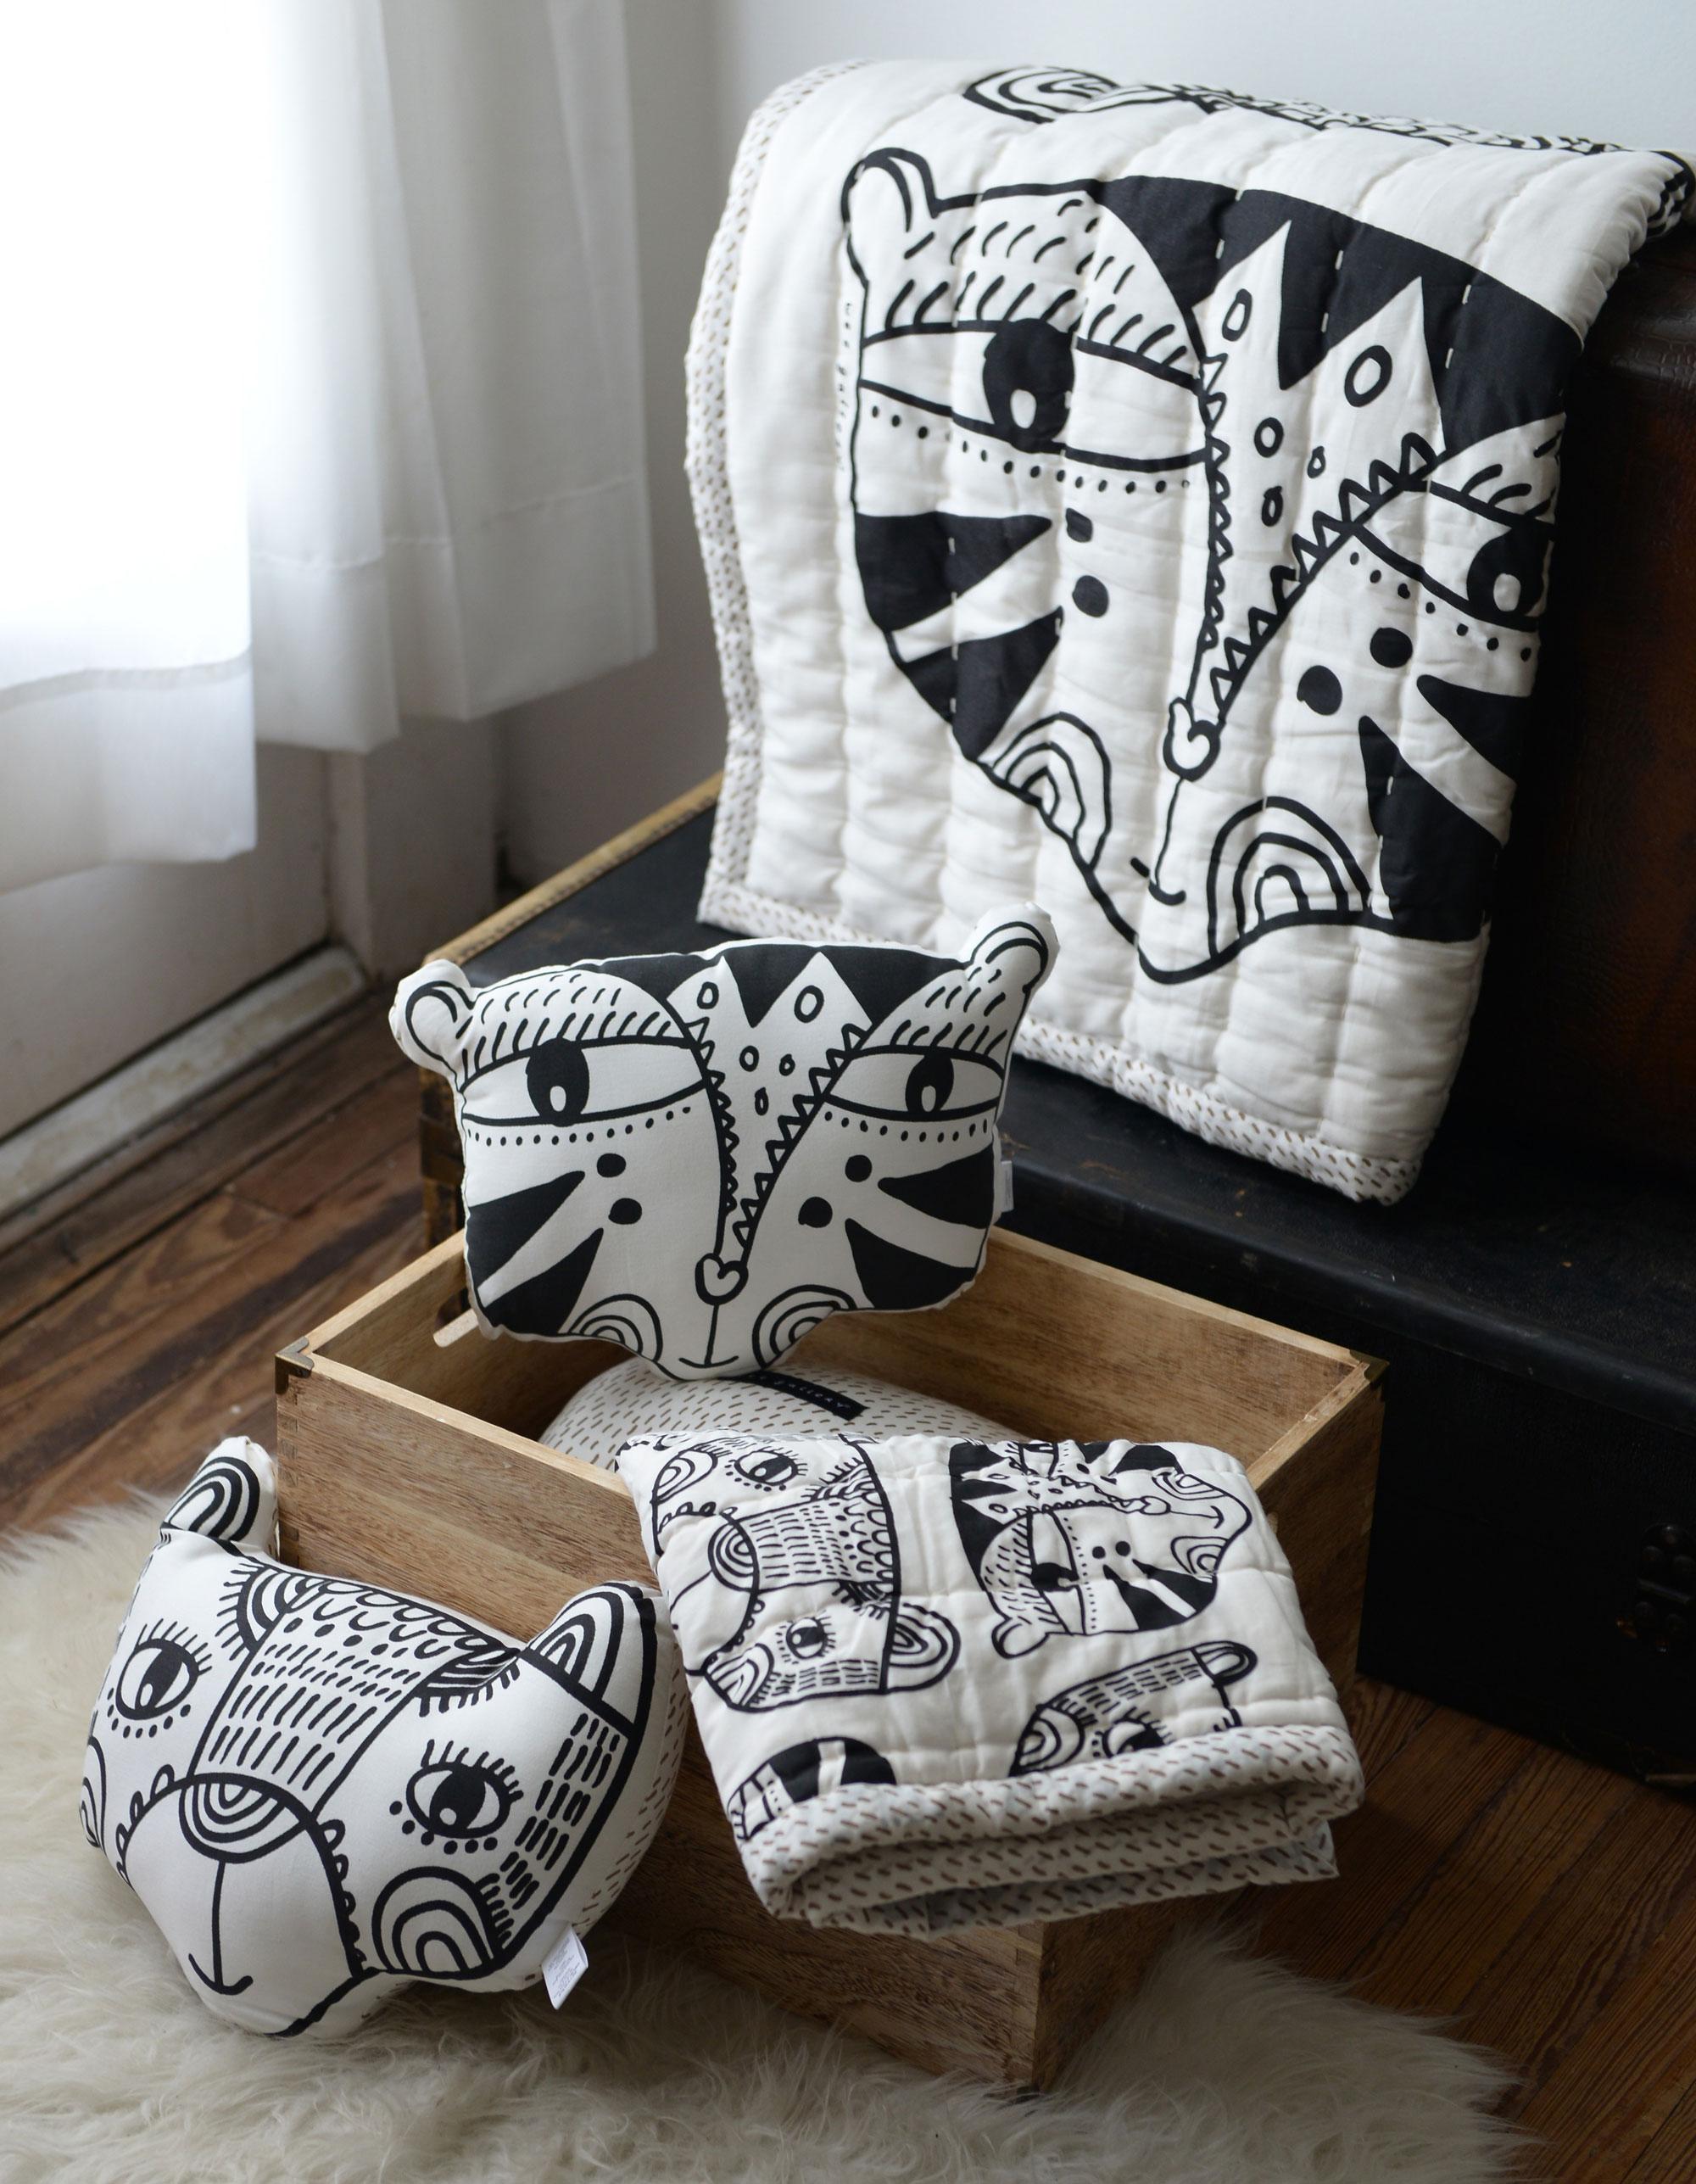 duurzaam speelgoed wee gallery kussens en plaids met zwart-witte print